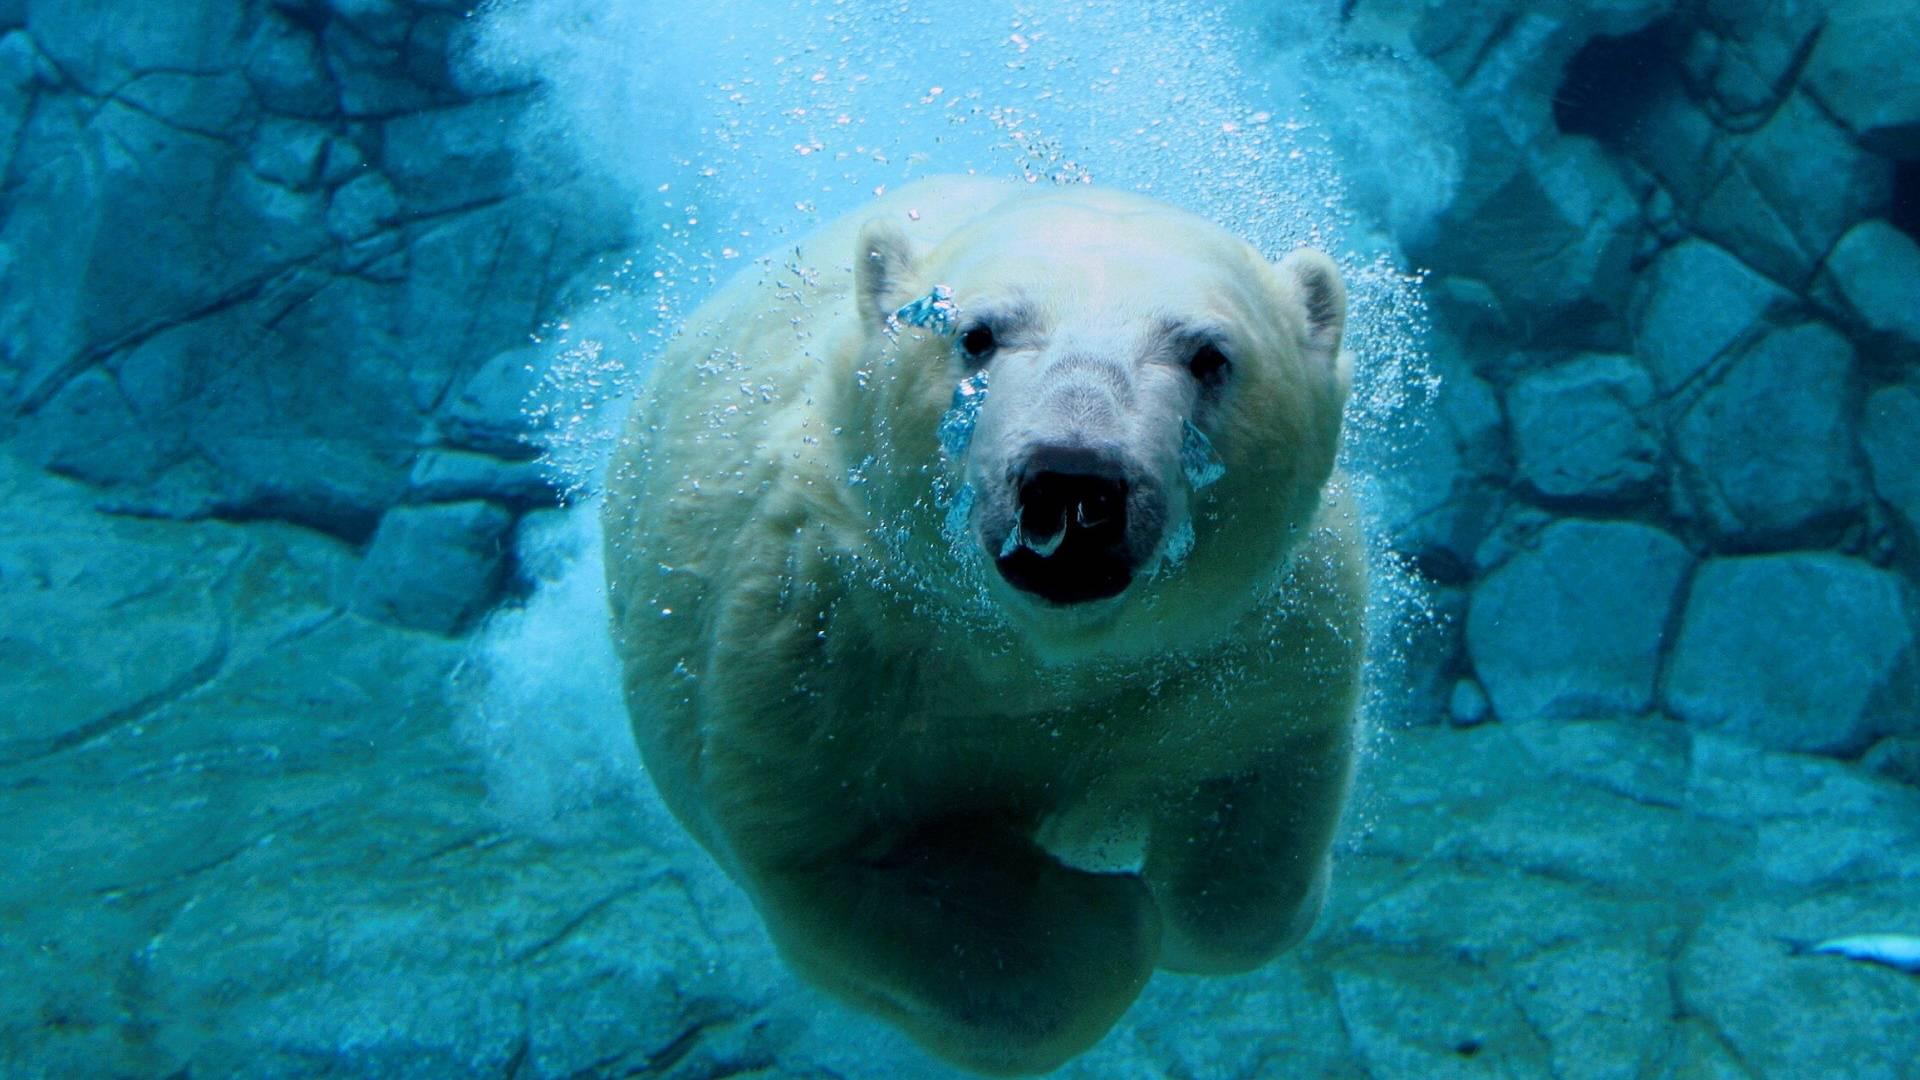 underwater images free download